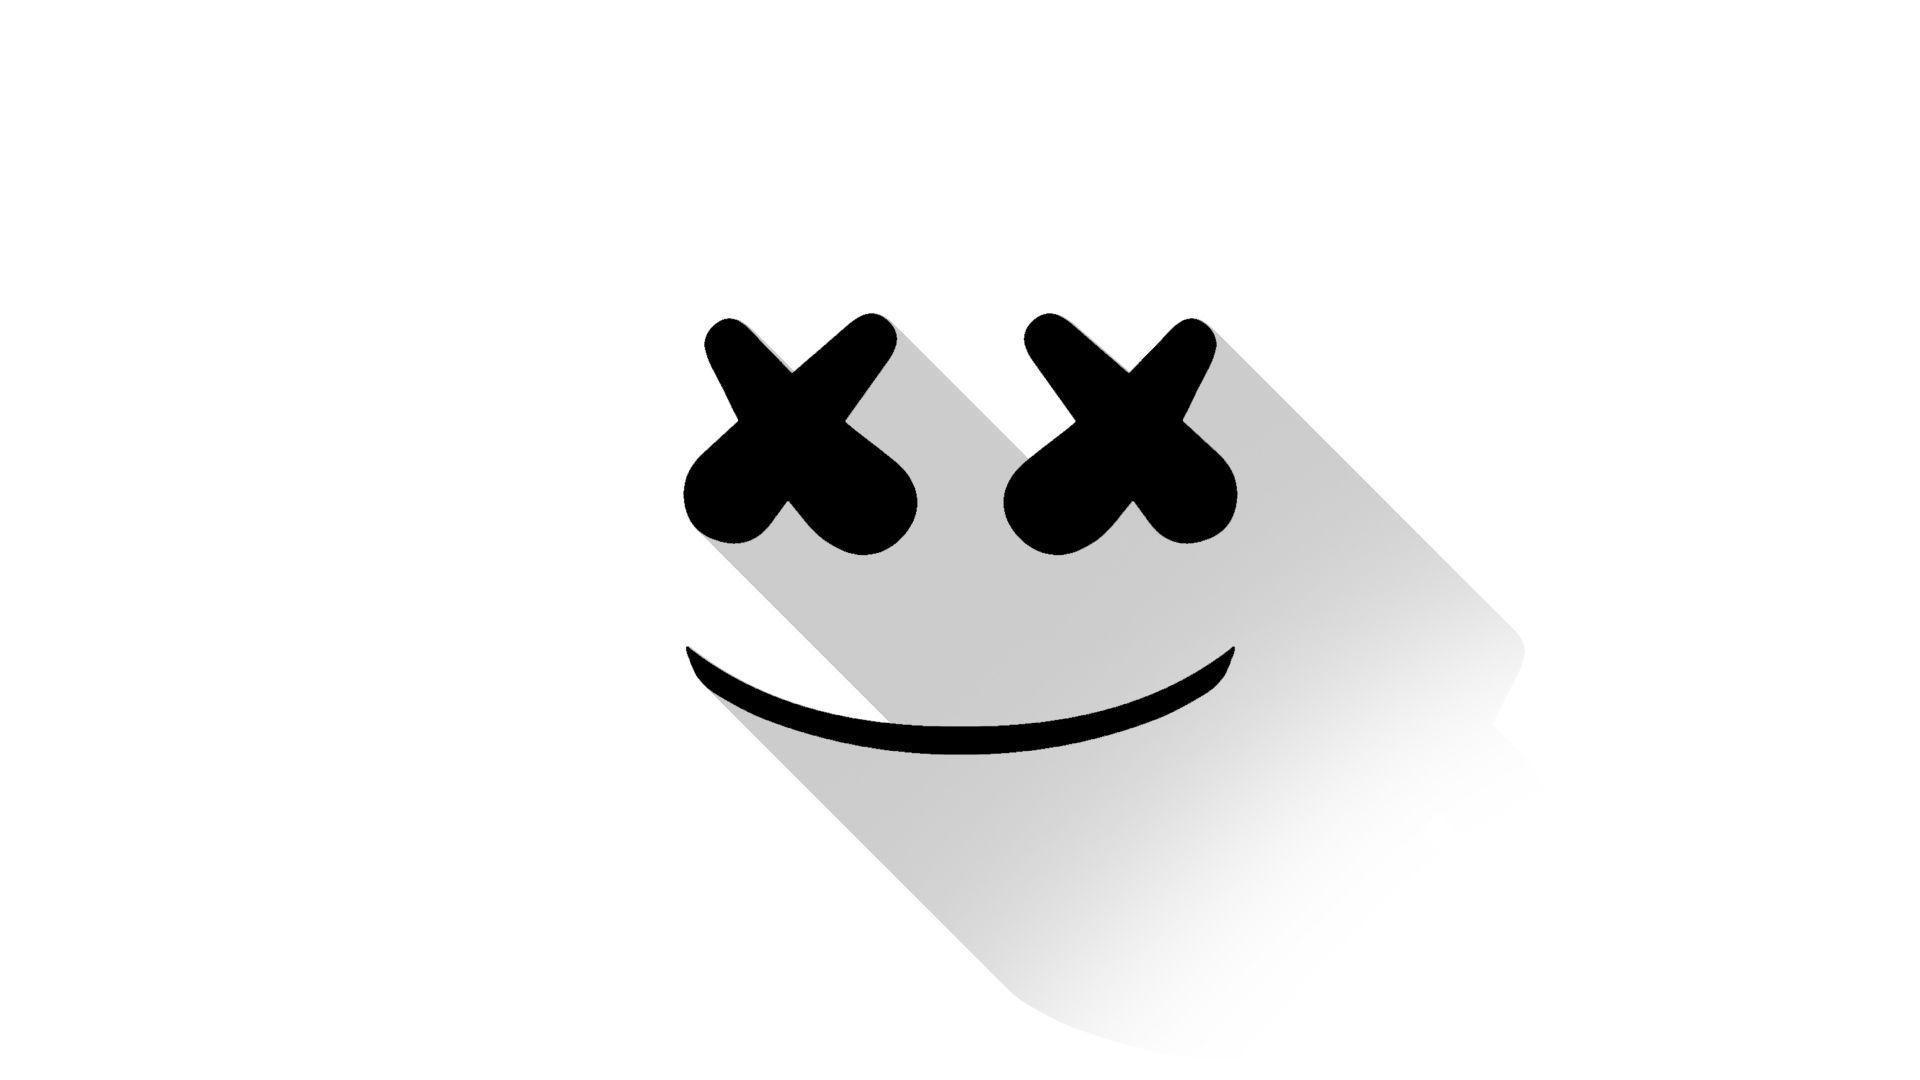 marshmello logo wallpaper 62755